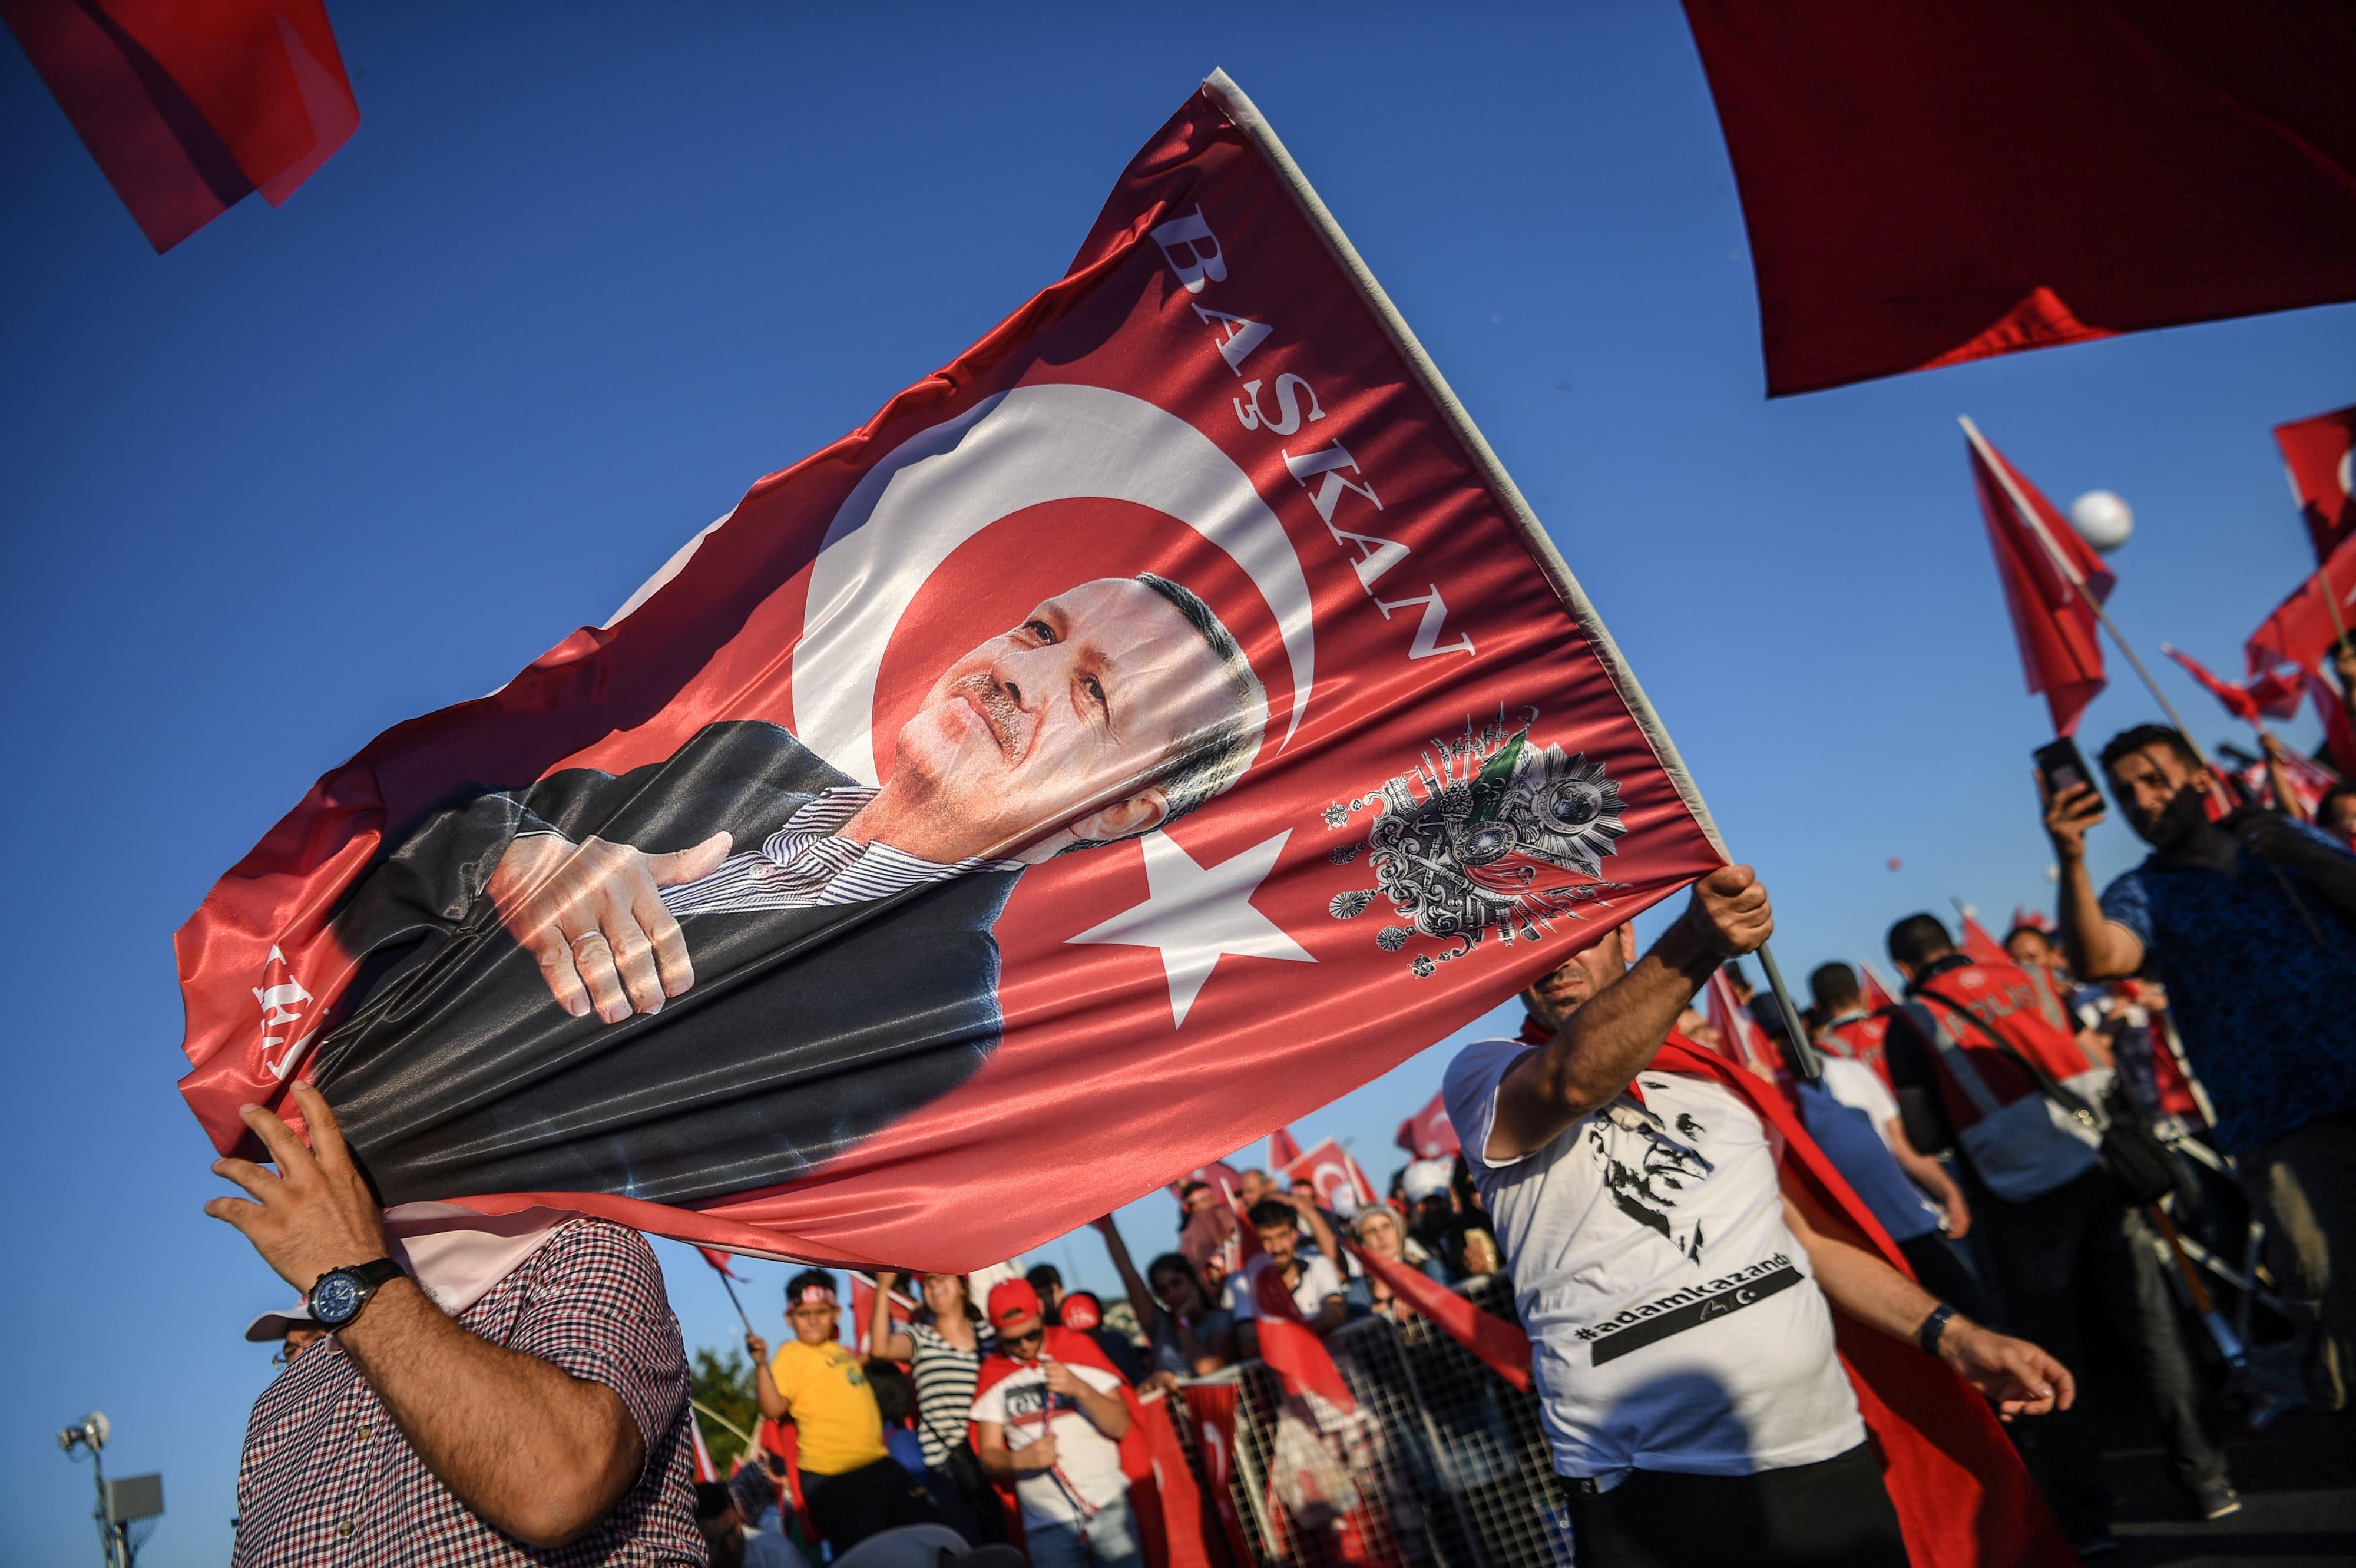 Turkish 'hacktivists' make cyberattacks on U S  journalists